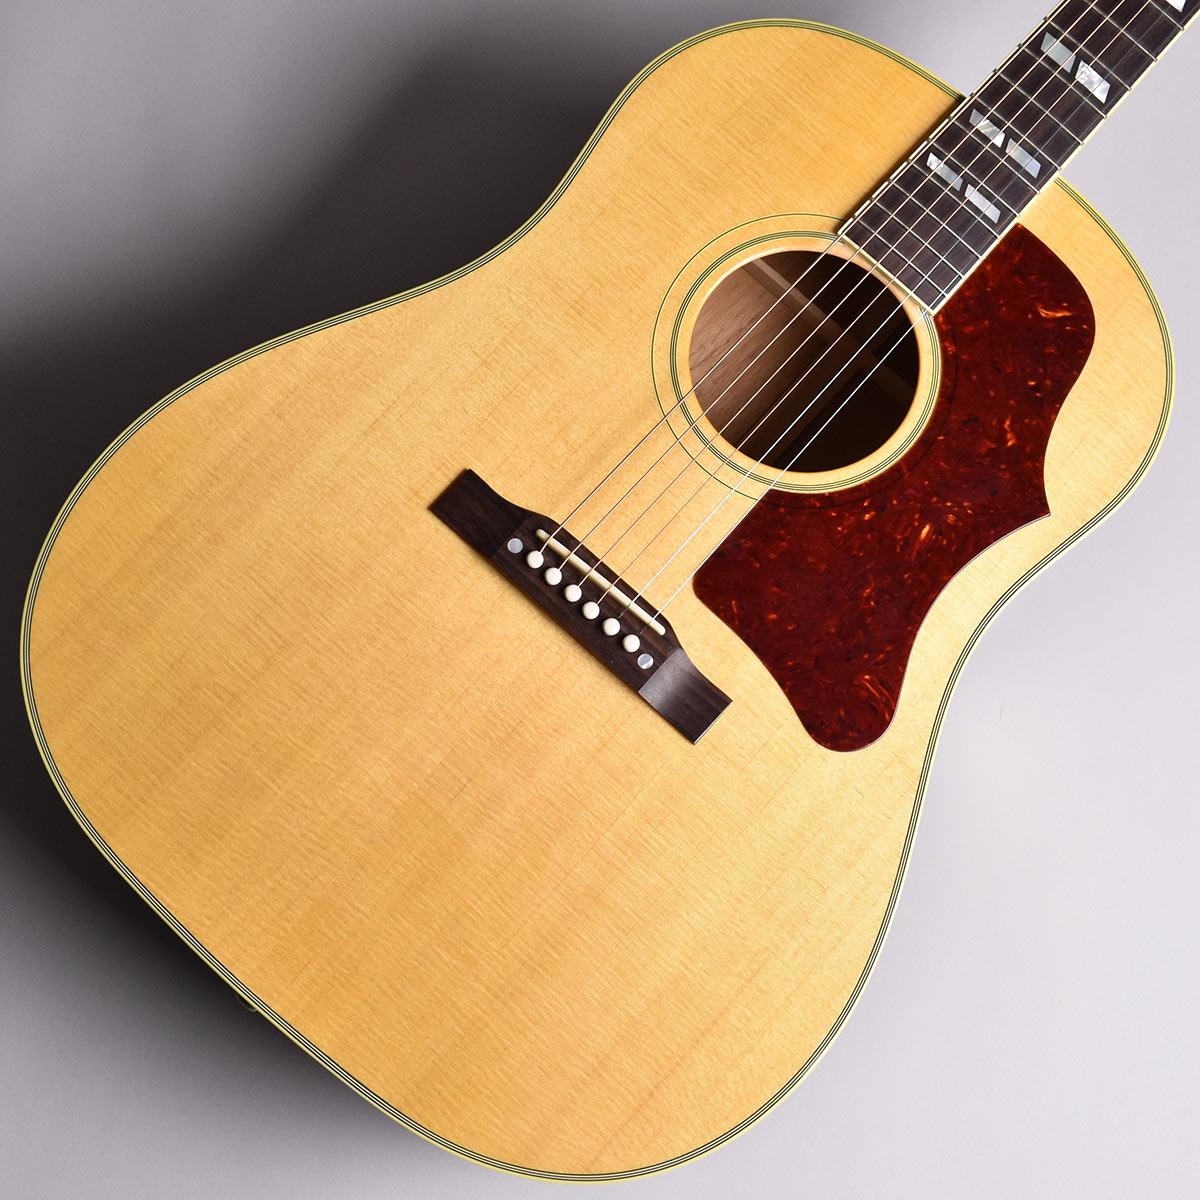 Gibson Southern Jumbo Triple Antique Natural S/N:12486016 【数量限定特典 ギグバック付属】【アウトレット品】 【ギブソン サザンジャンボ】【未展示品】